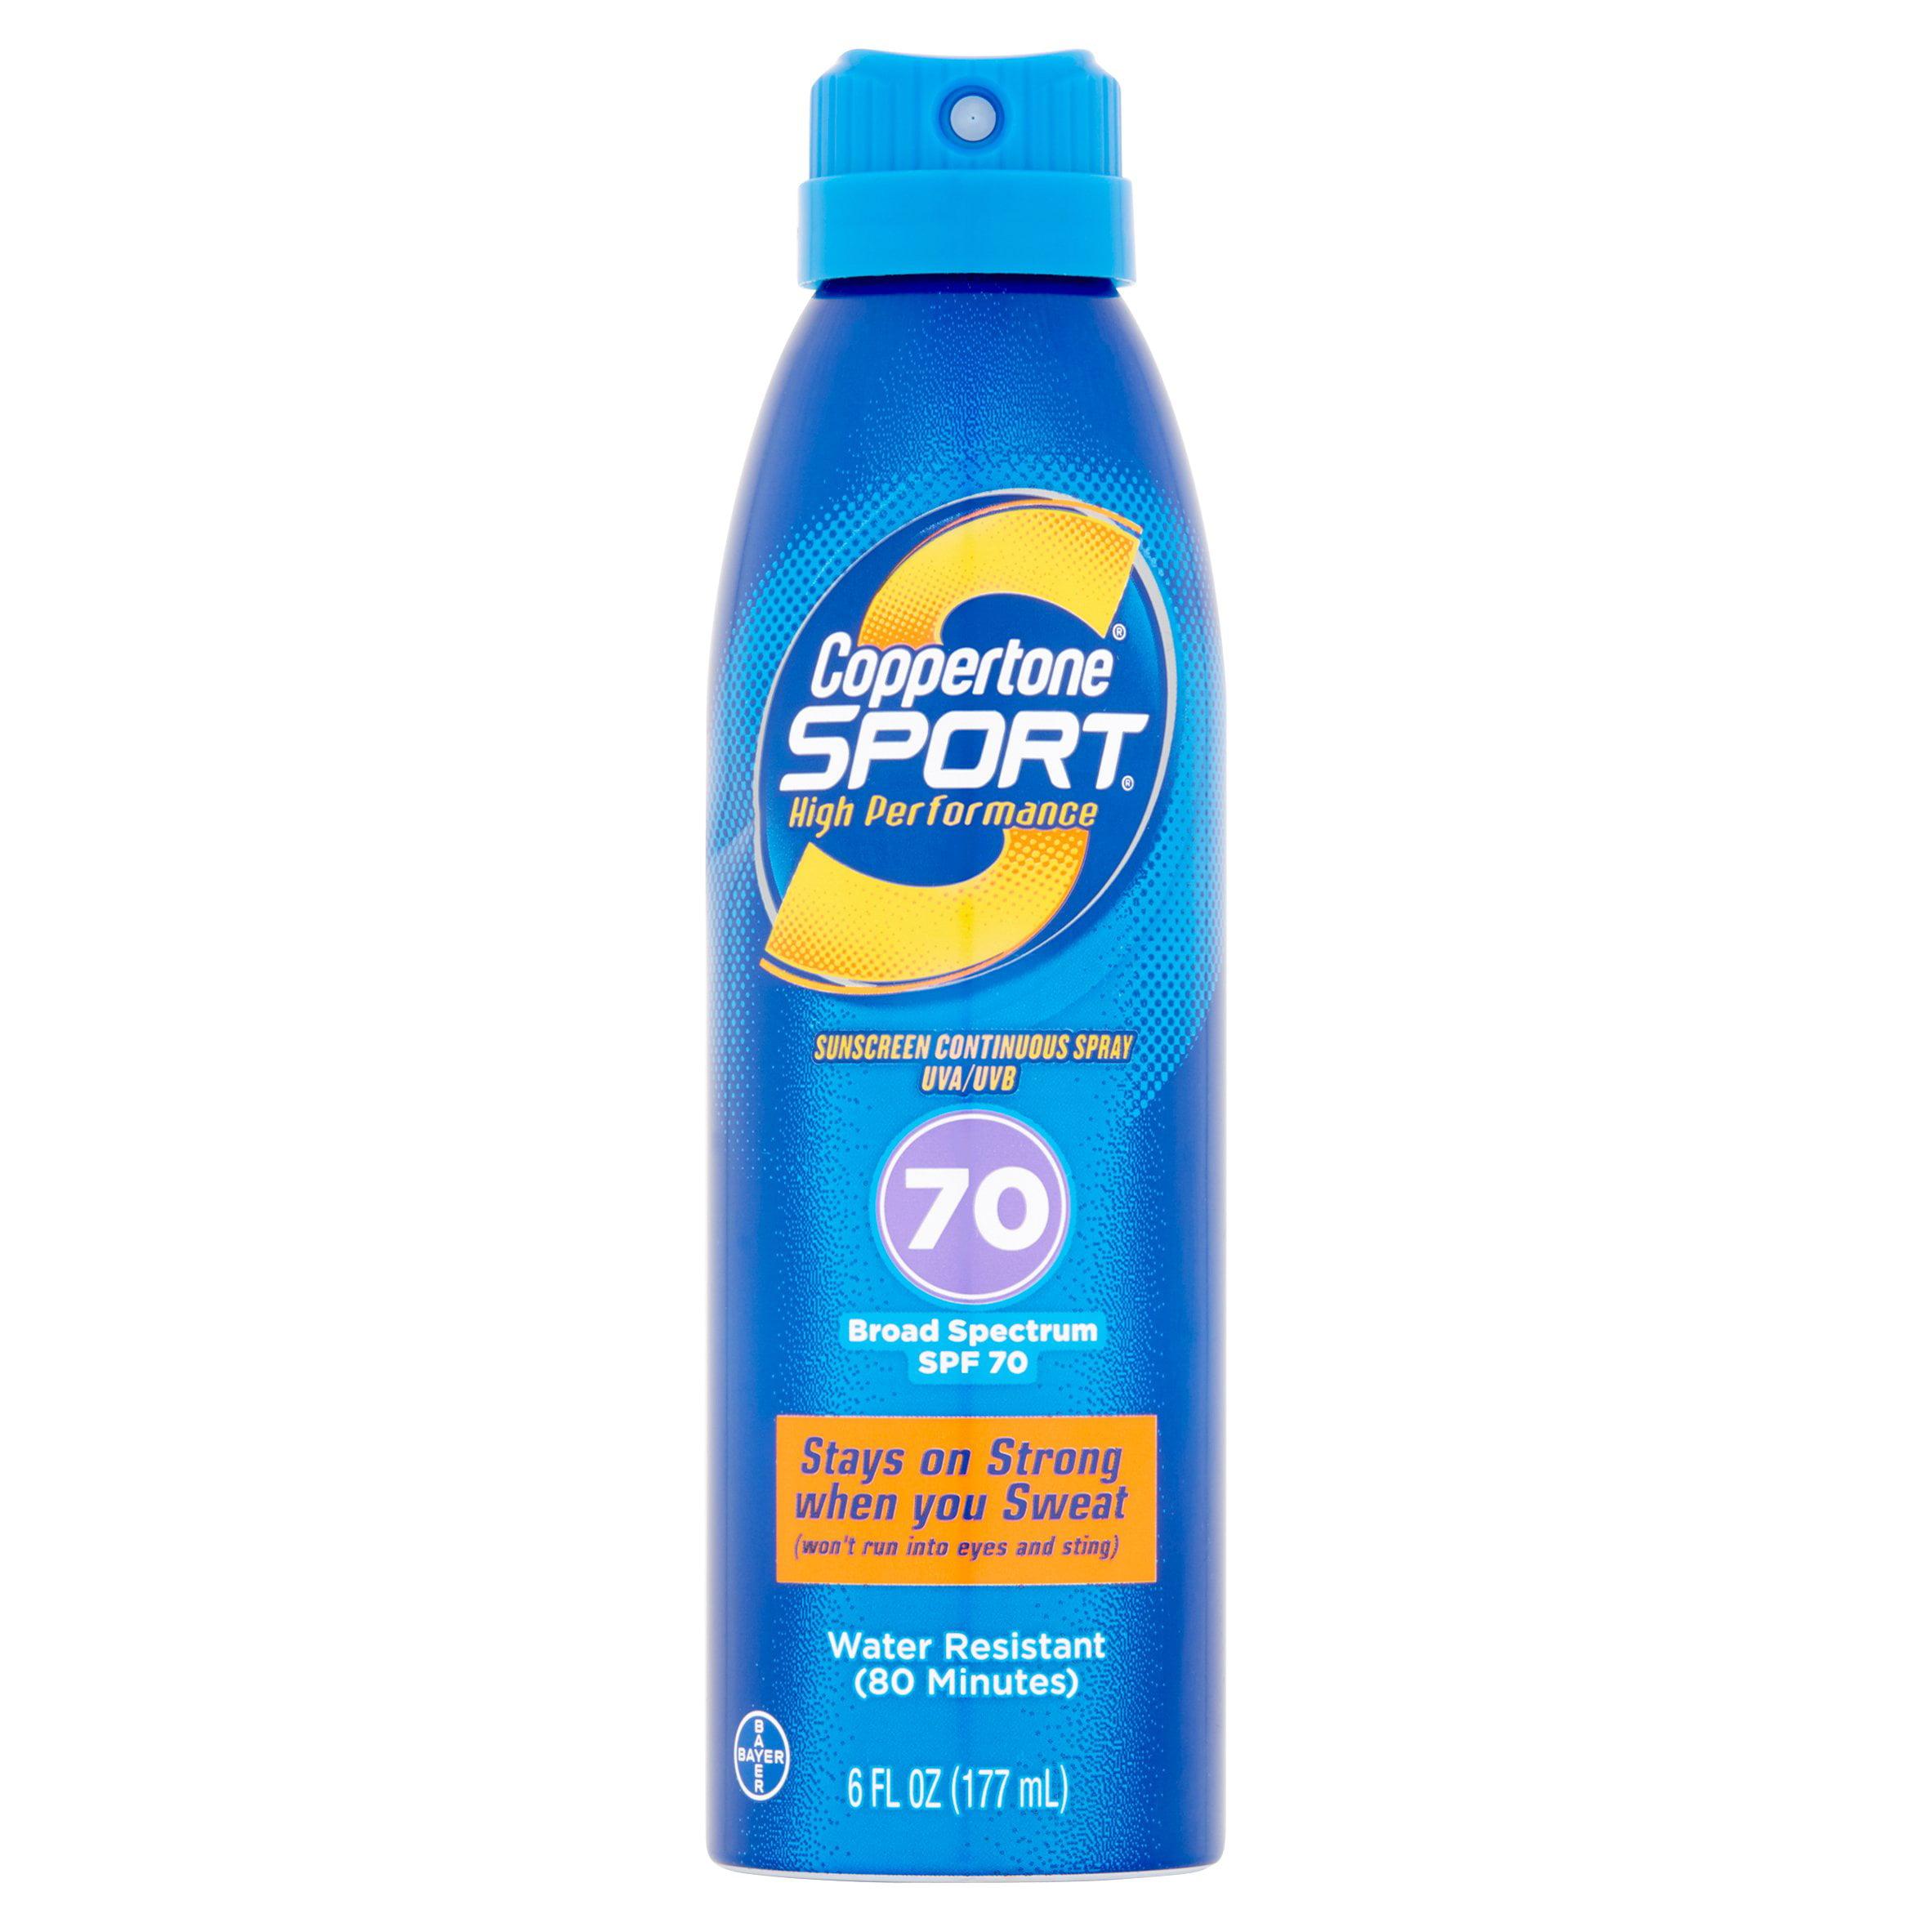 Bayer Coppertone Sport Sunscreen Continuous Spray UVA/UVB Broad Spectrum, SPF 70, 6 fl oz